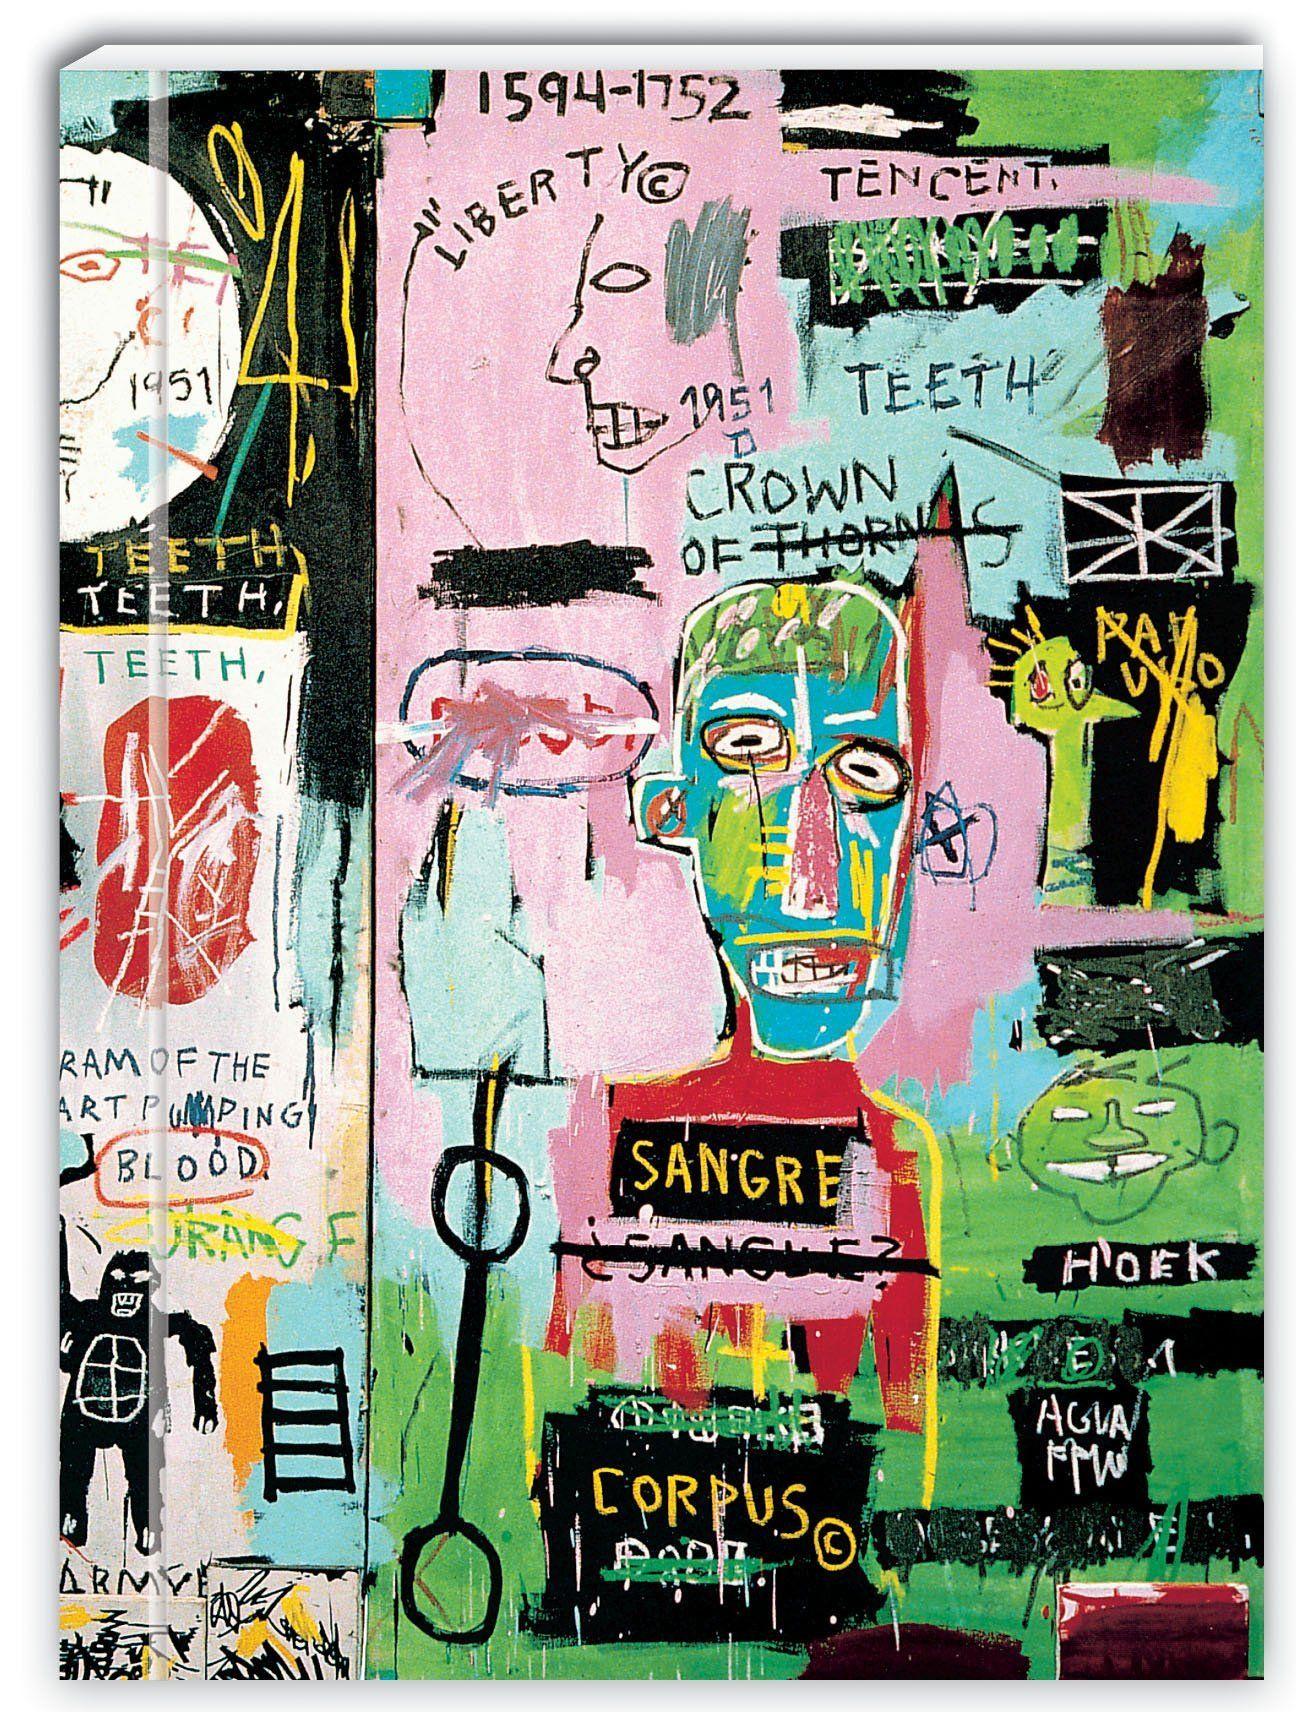 how did jean michel basquiat die